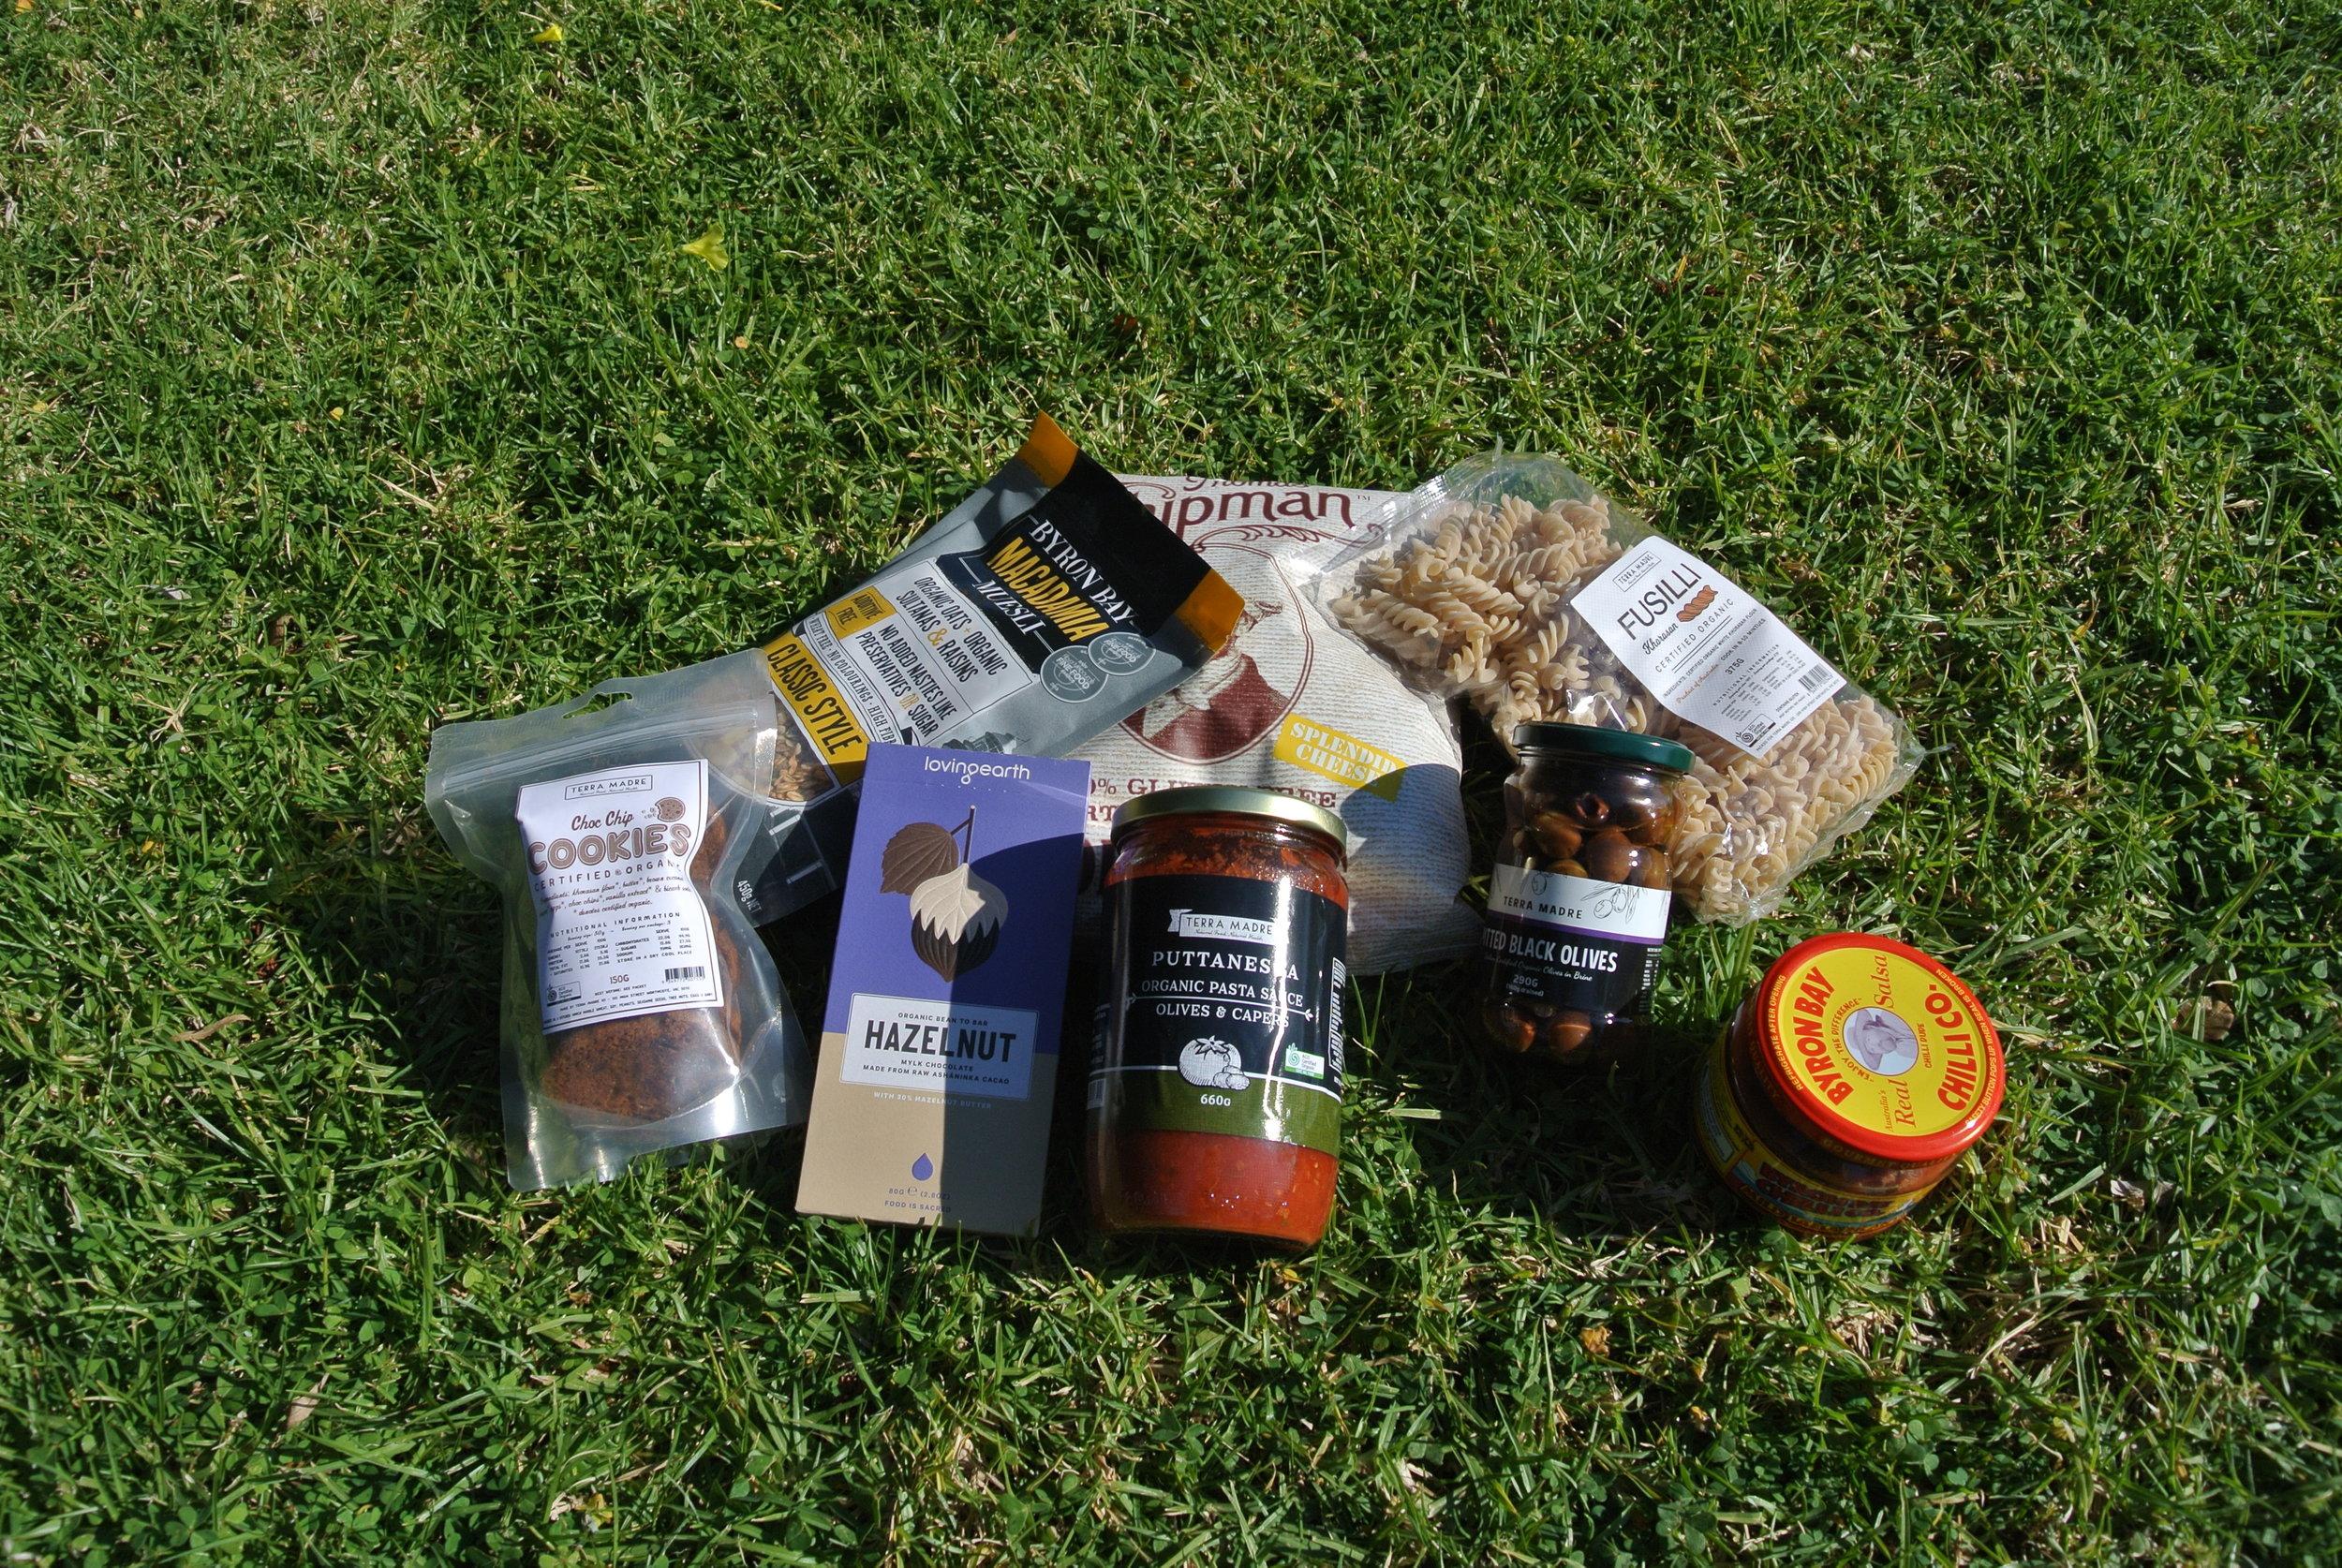 Organic Survival Hamper by Terra Madre